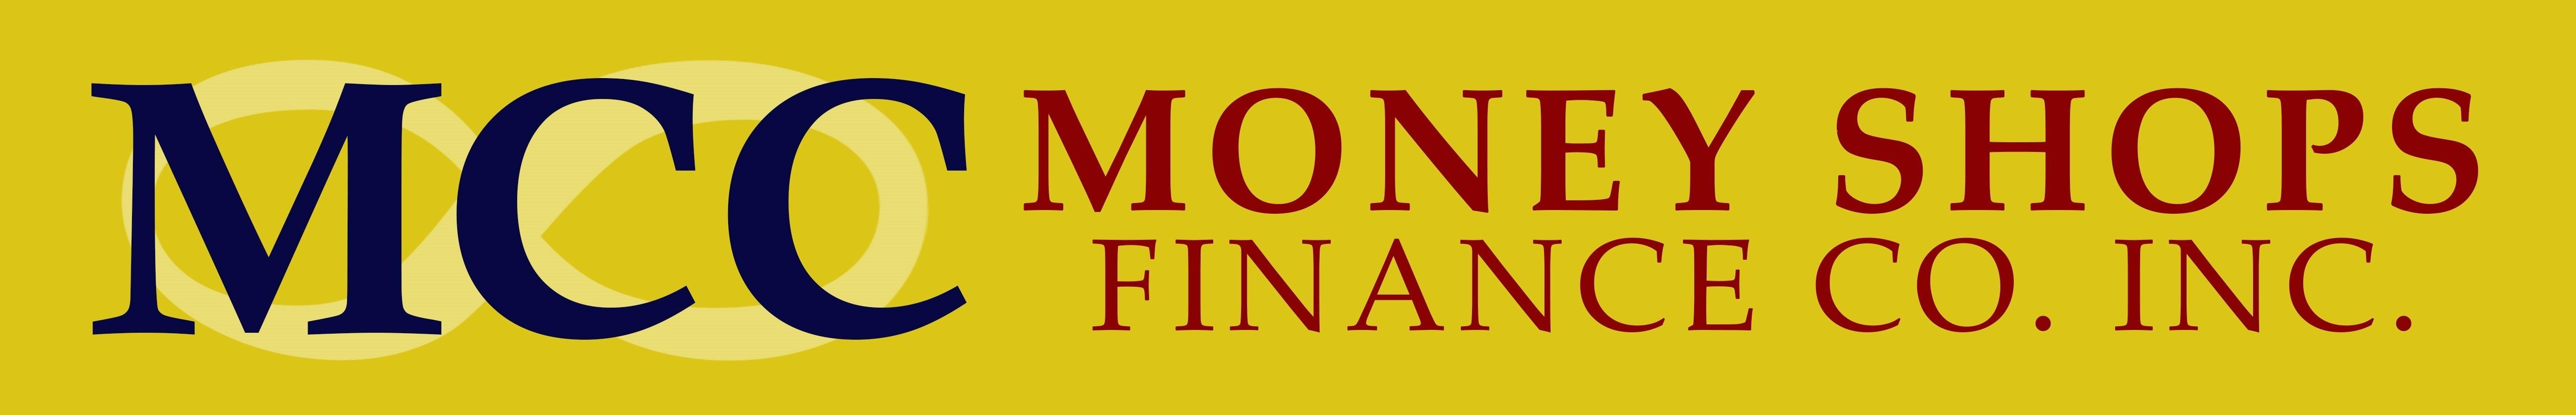 MCC Money Shops Finance Co. Inc.